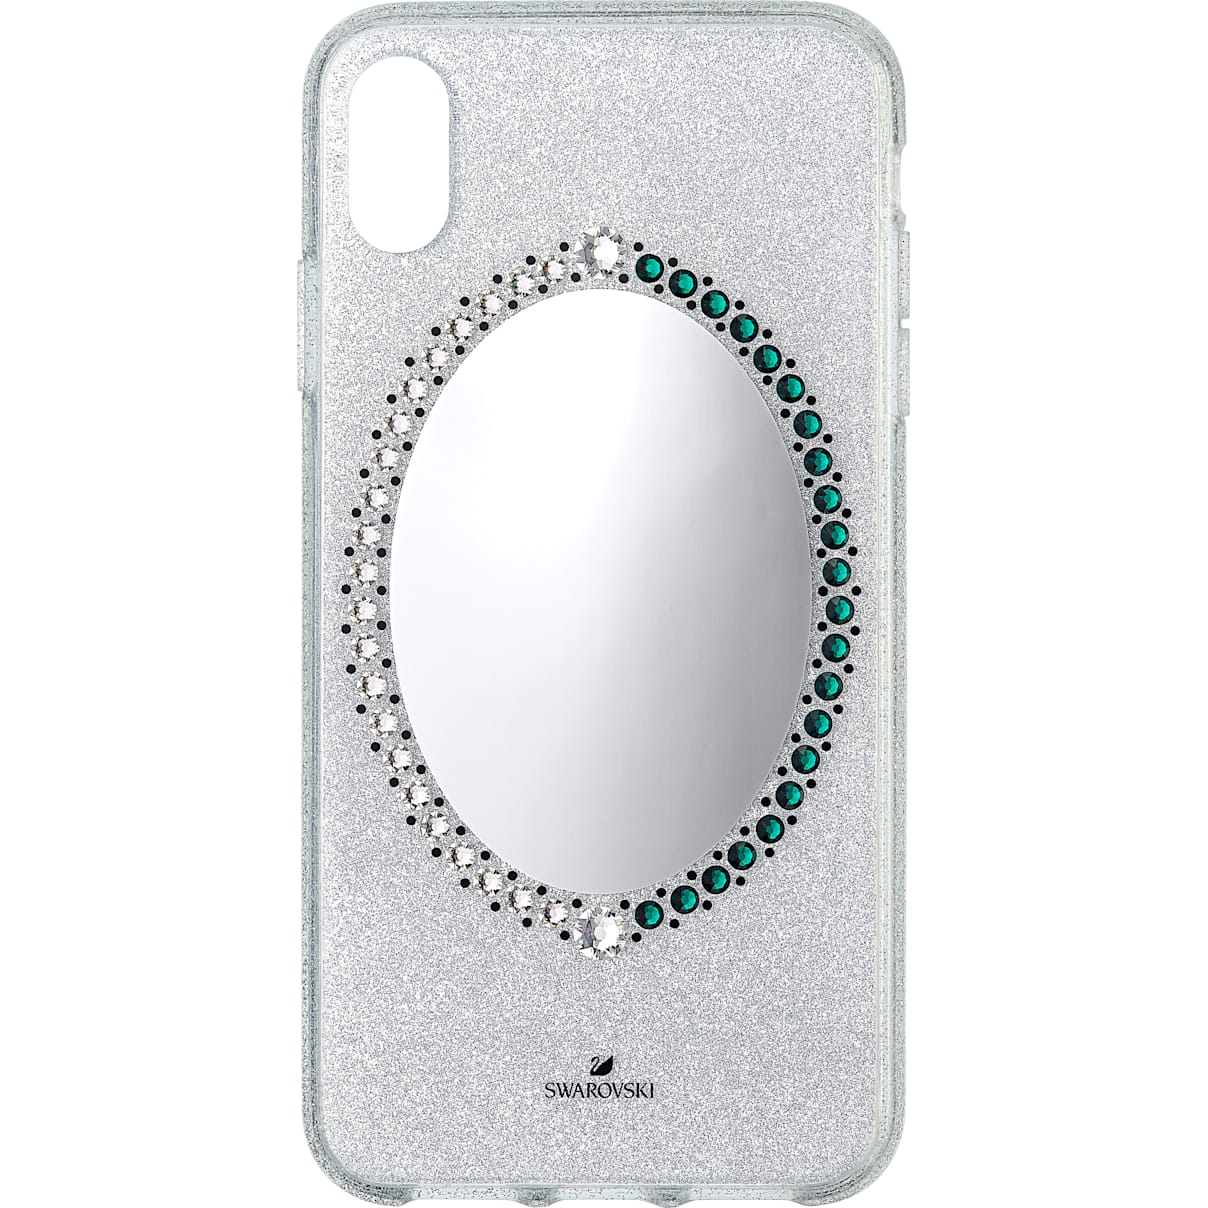 Swarovski Black Baroque Smartphone Case, iPhone® XS Max, Gray